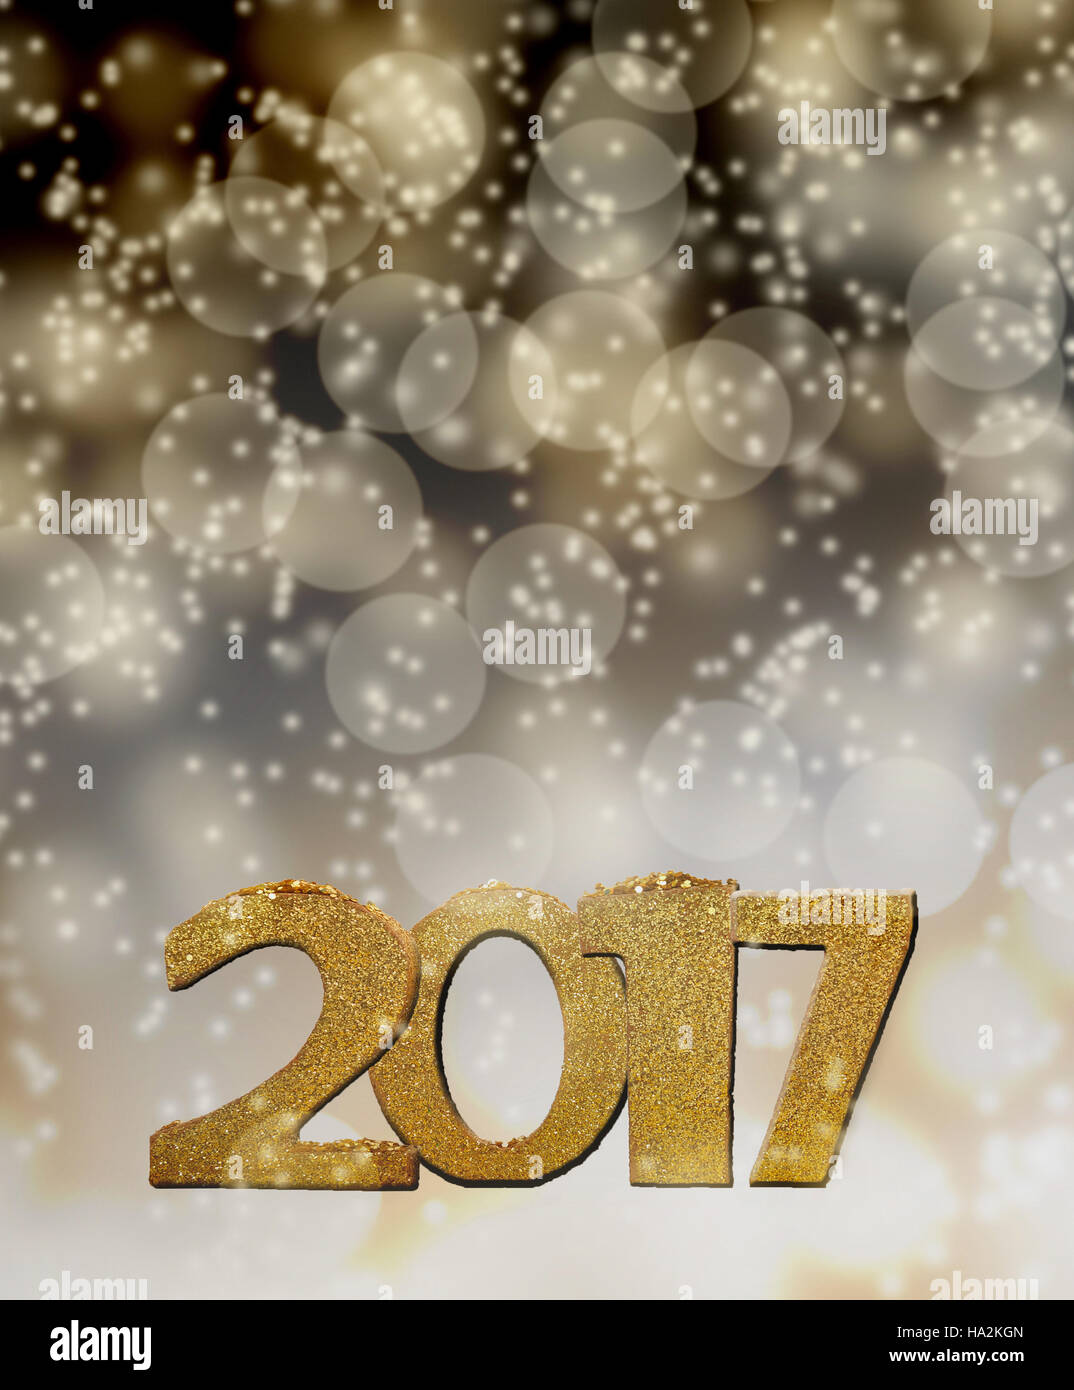 golden figures 2017 on lights background - Stock Image